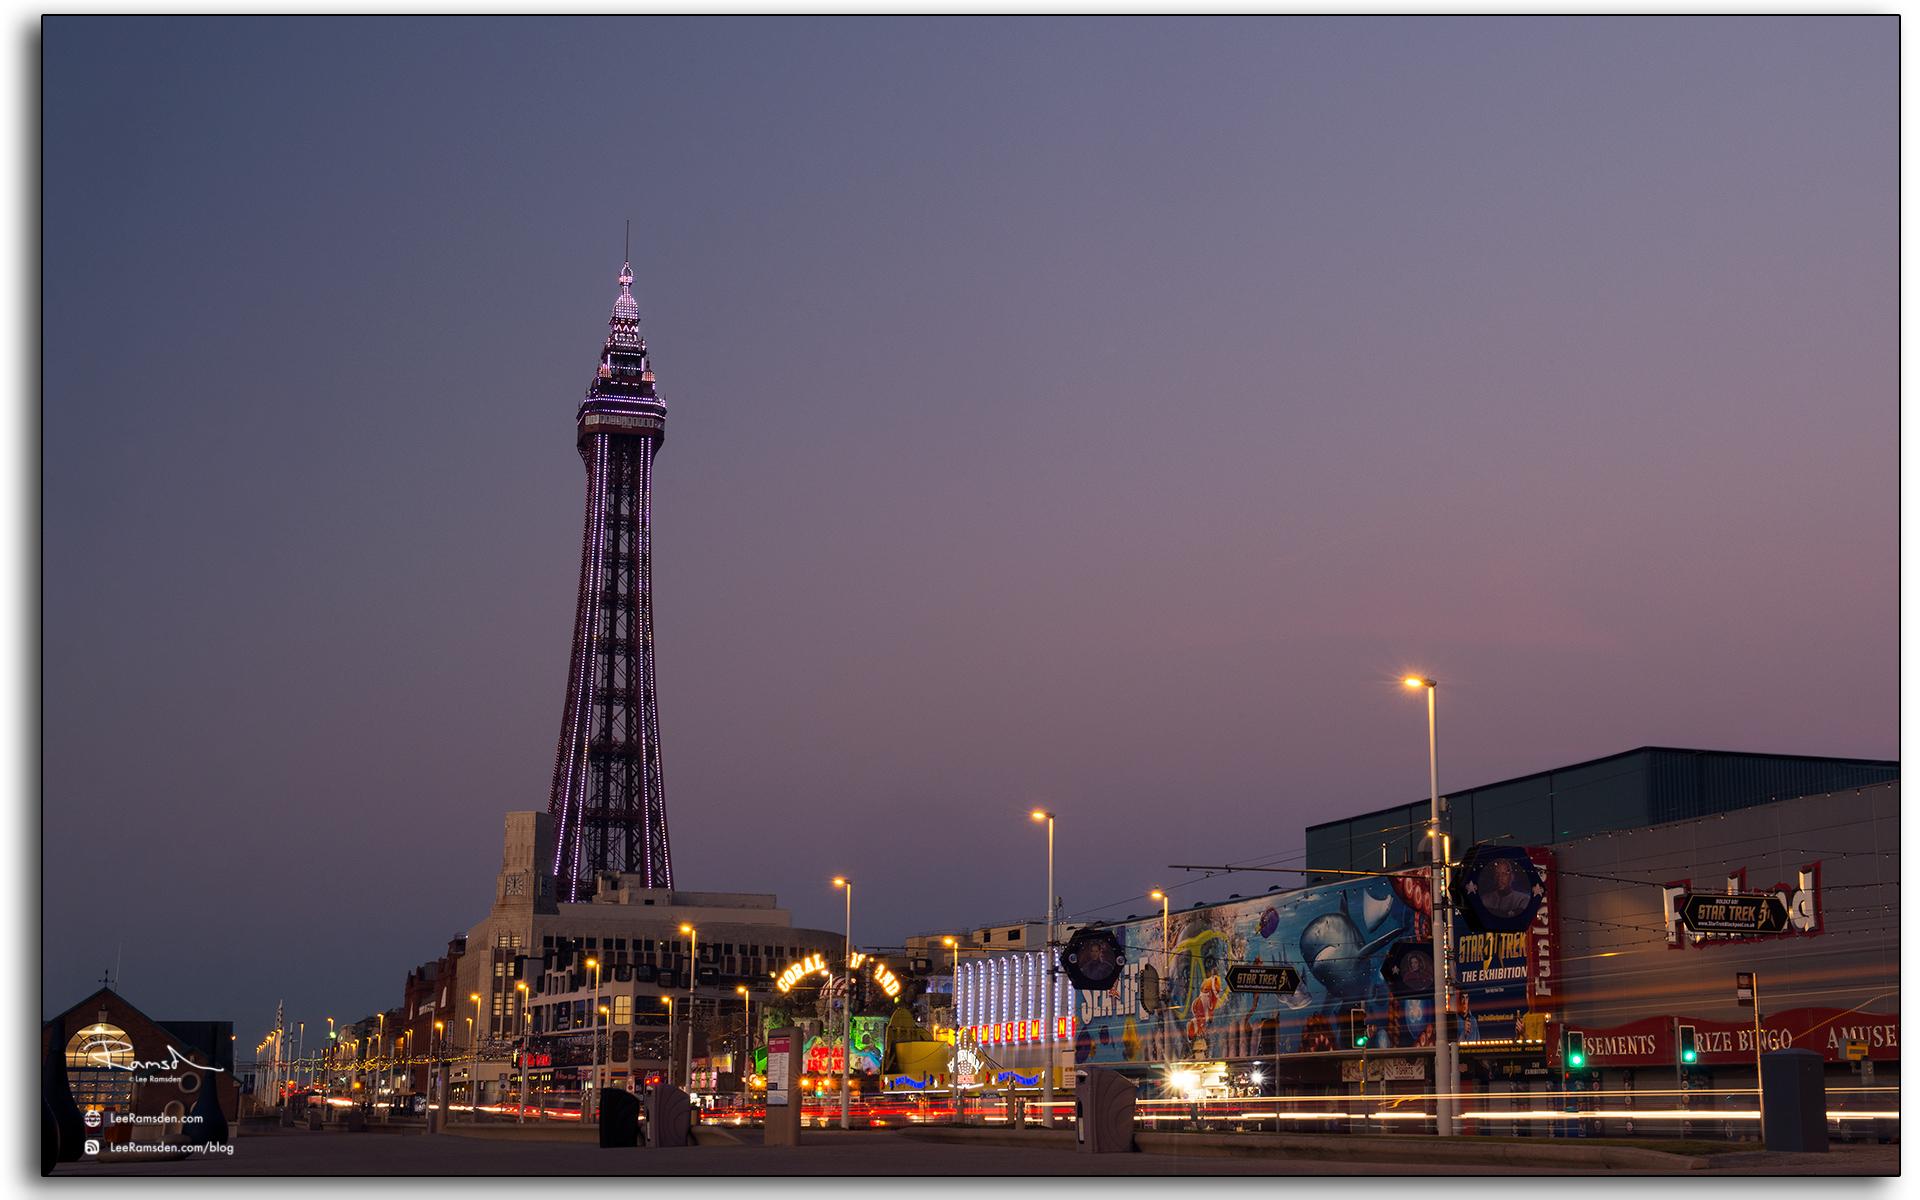 Blackpool Tower LED lighting dusk illuminations prom lights Landscape photographer Lee Ramsden